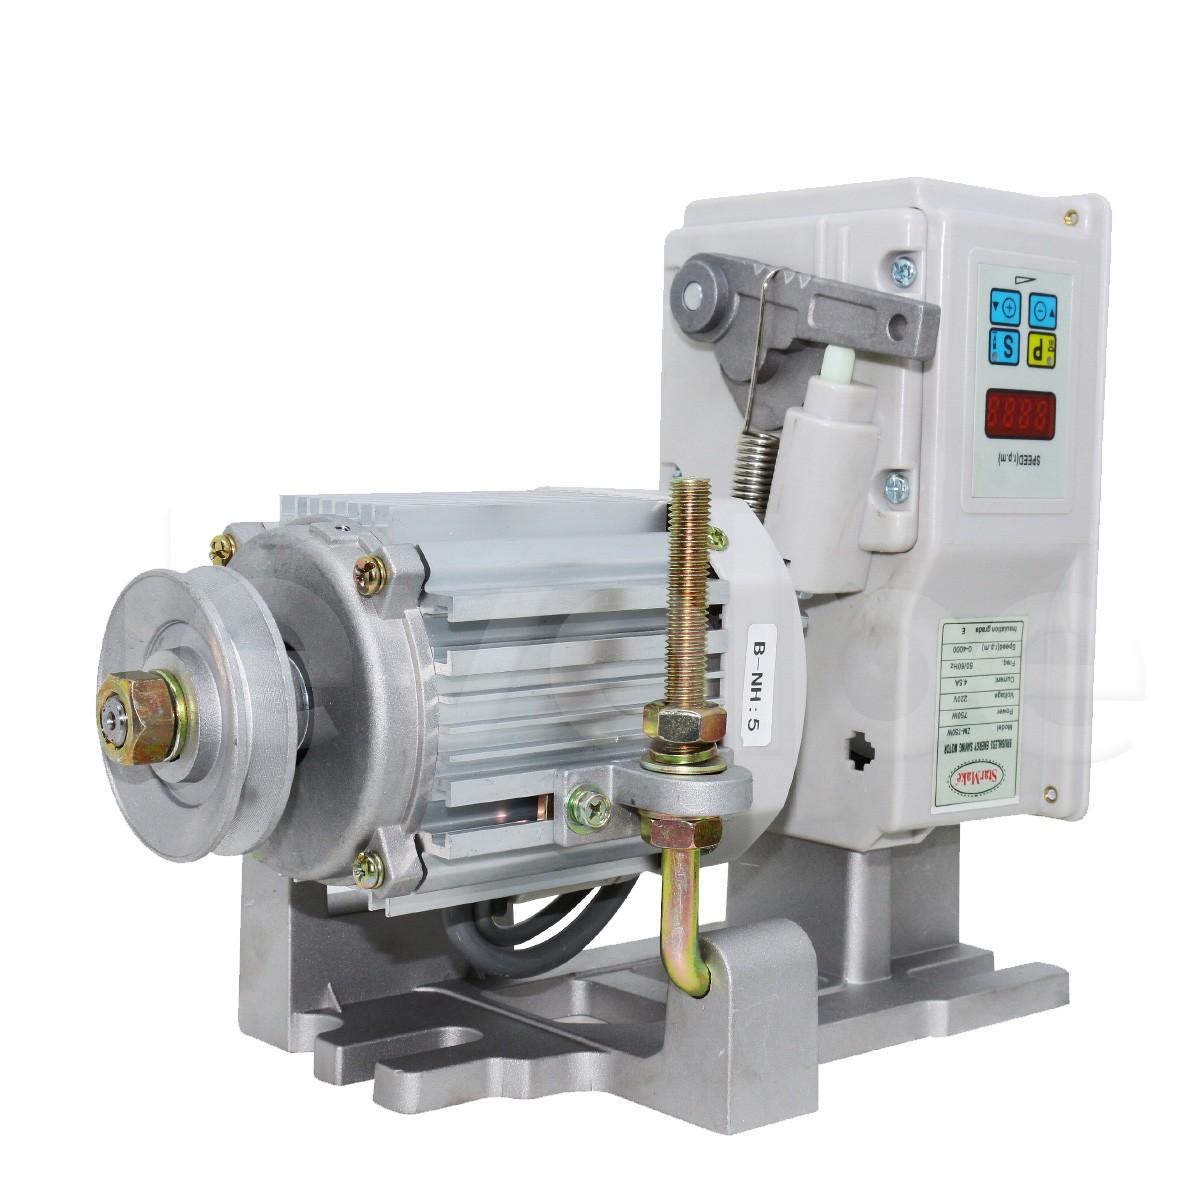 Motor Eletrônico Direct Drive Para Maquina Reta Industrial 750w